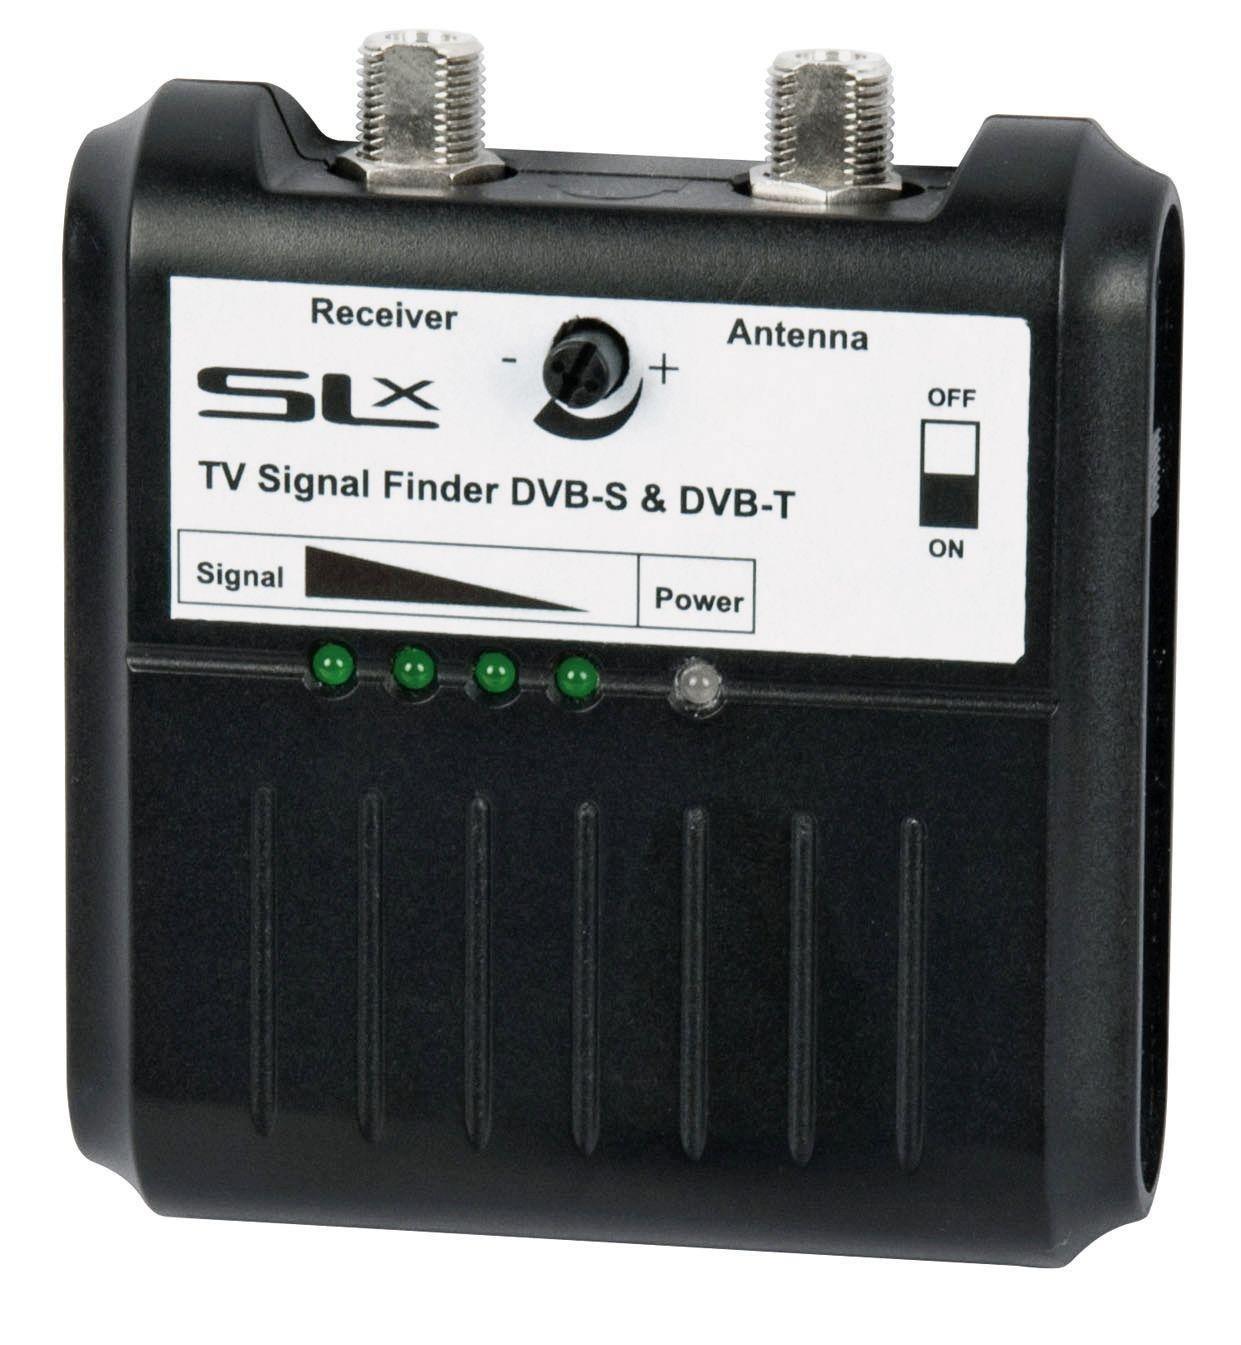 SLx - Digital - TV and Satellite Aerial Signal Detector